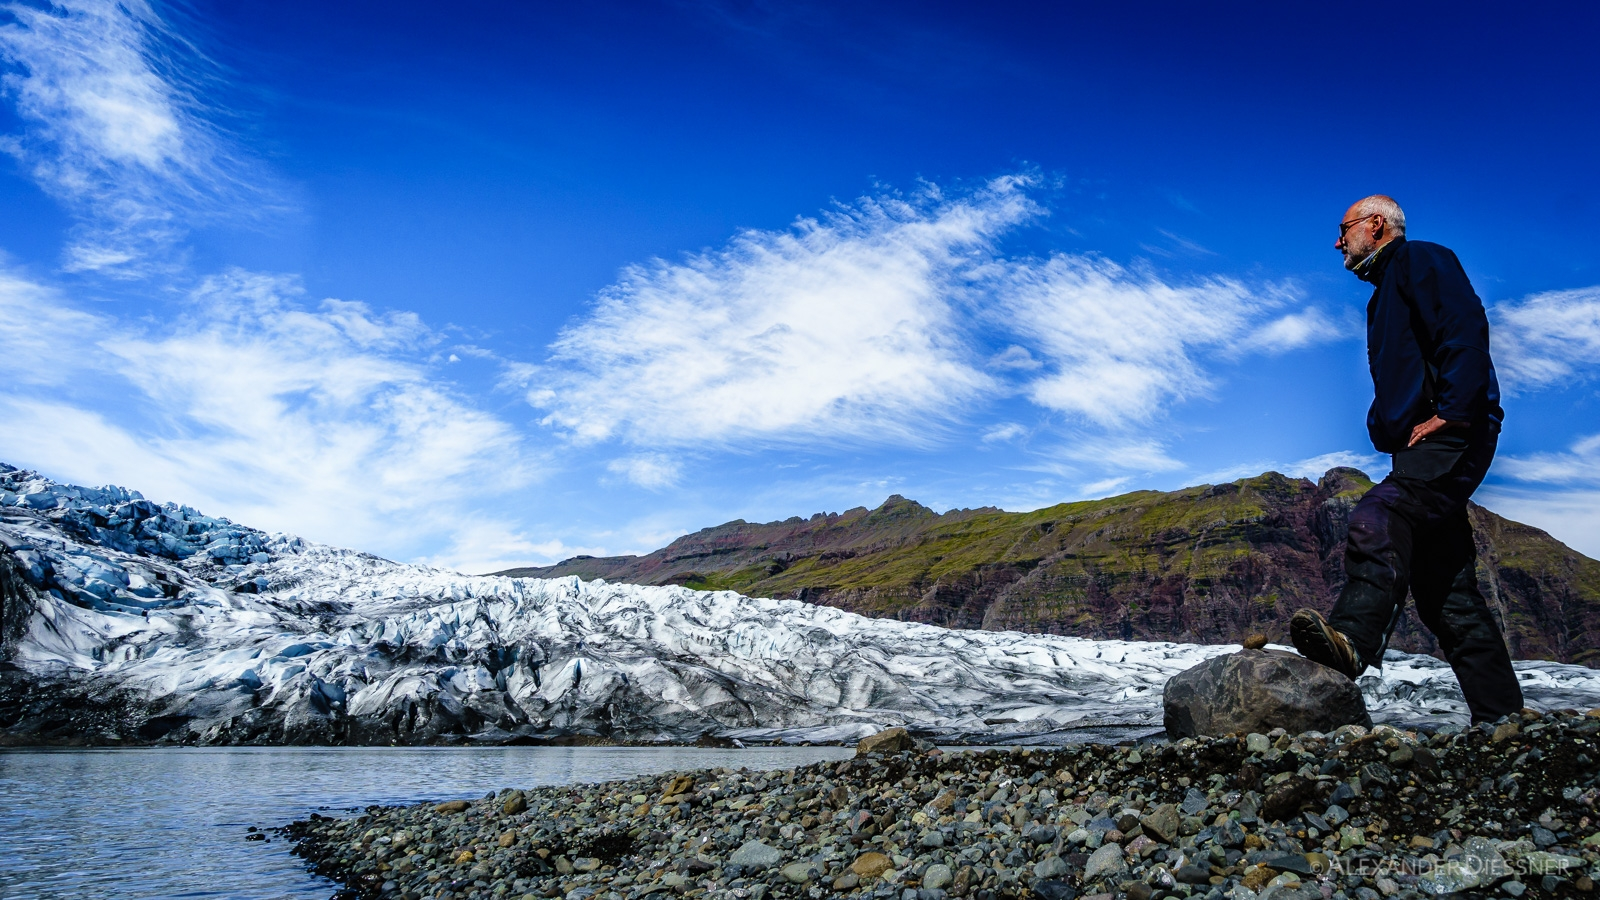 Gletzerzunge Flaajökull